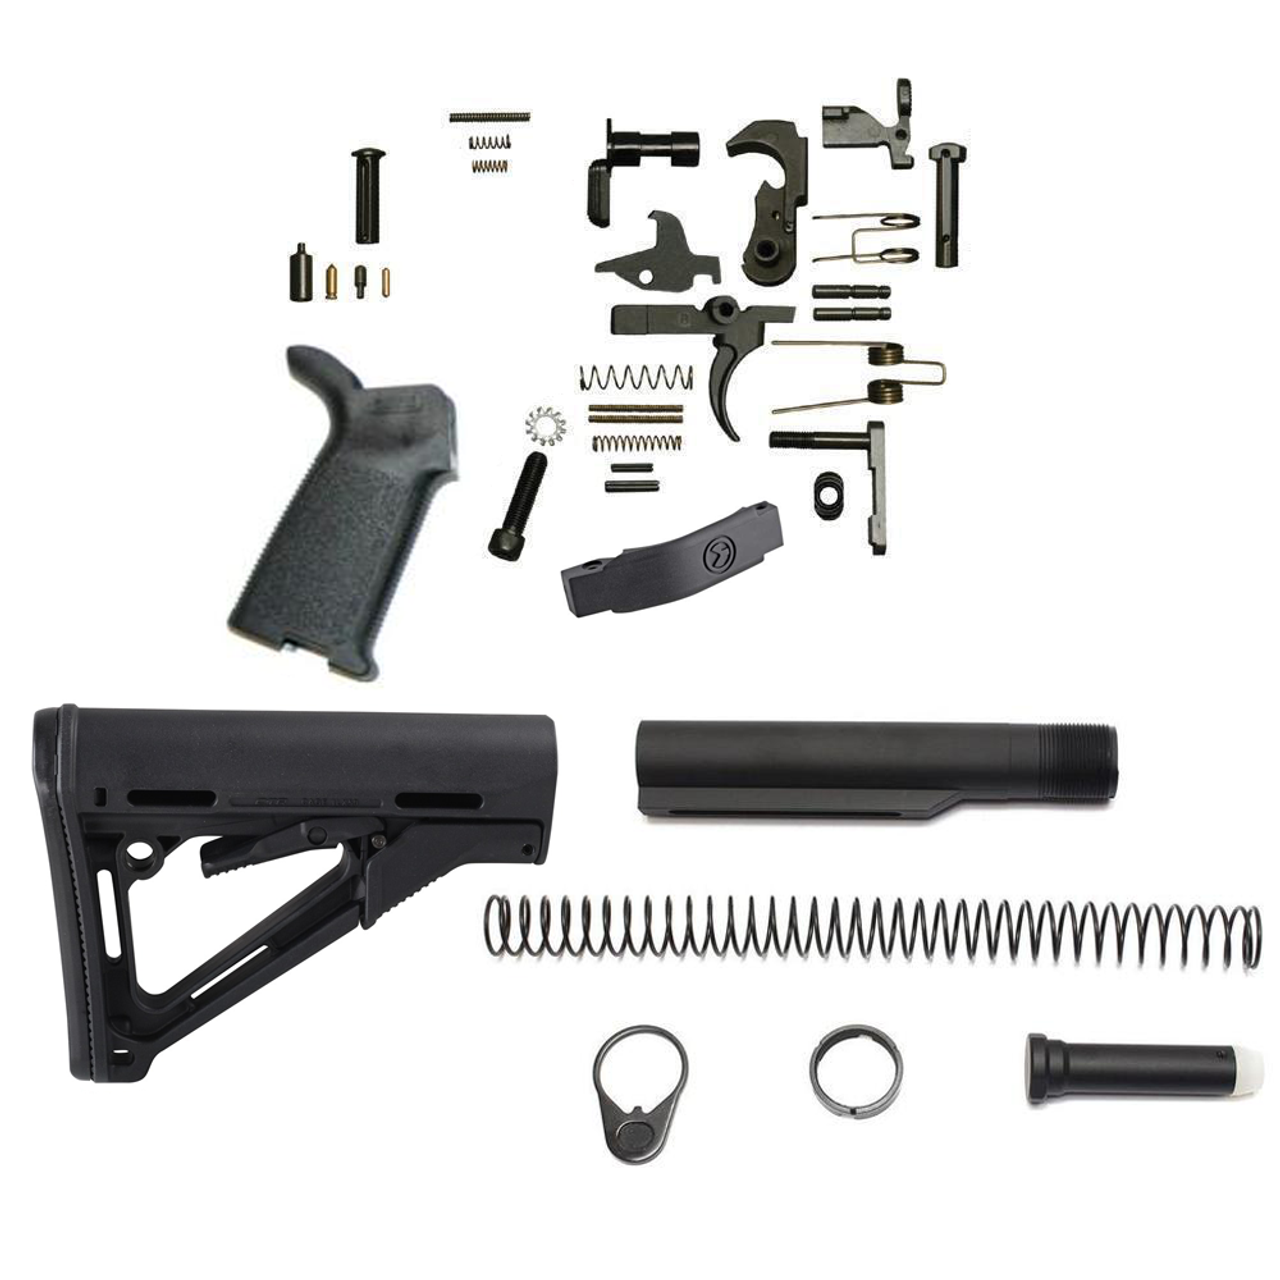 Magpul CTR Lower Build Kit (Black)